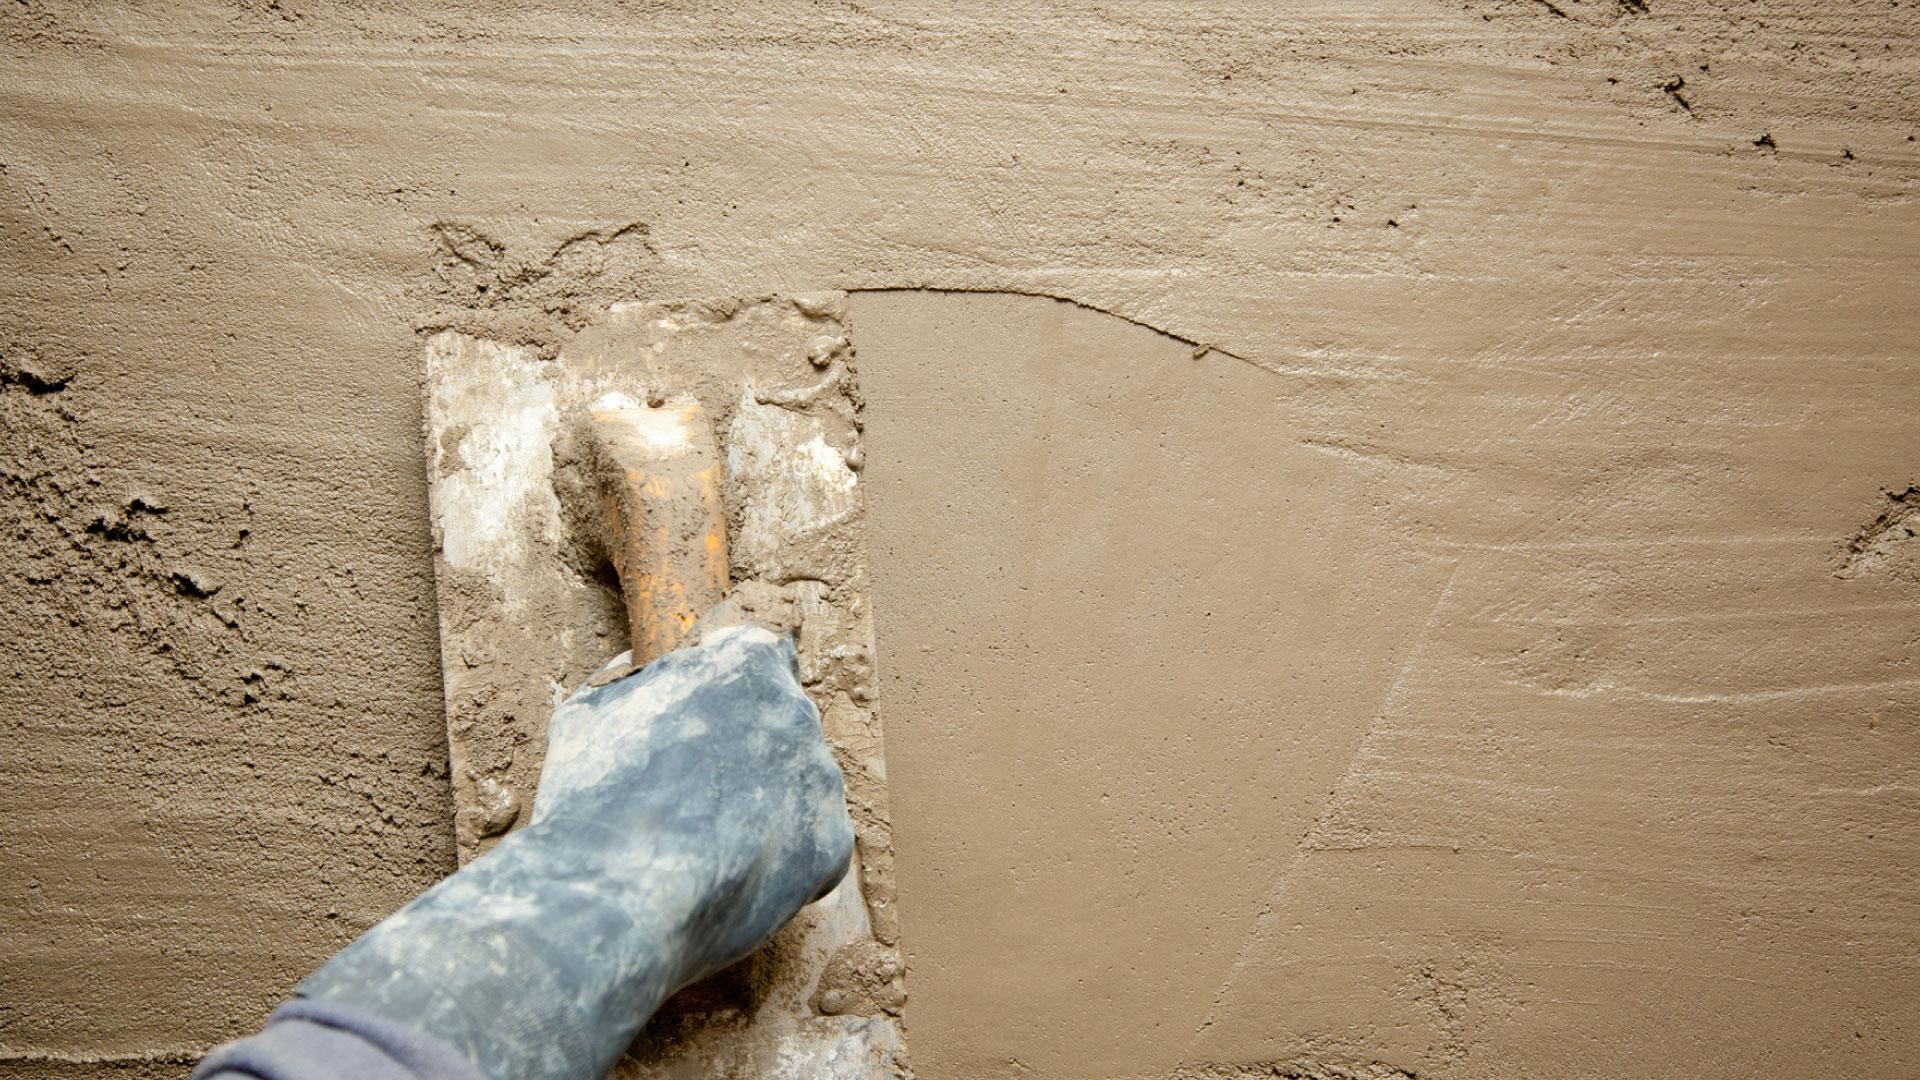 Kzn Property Maintenance Services